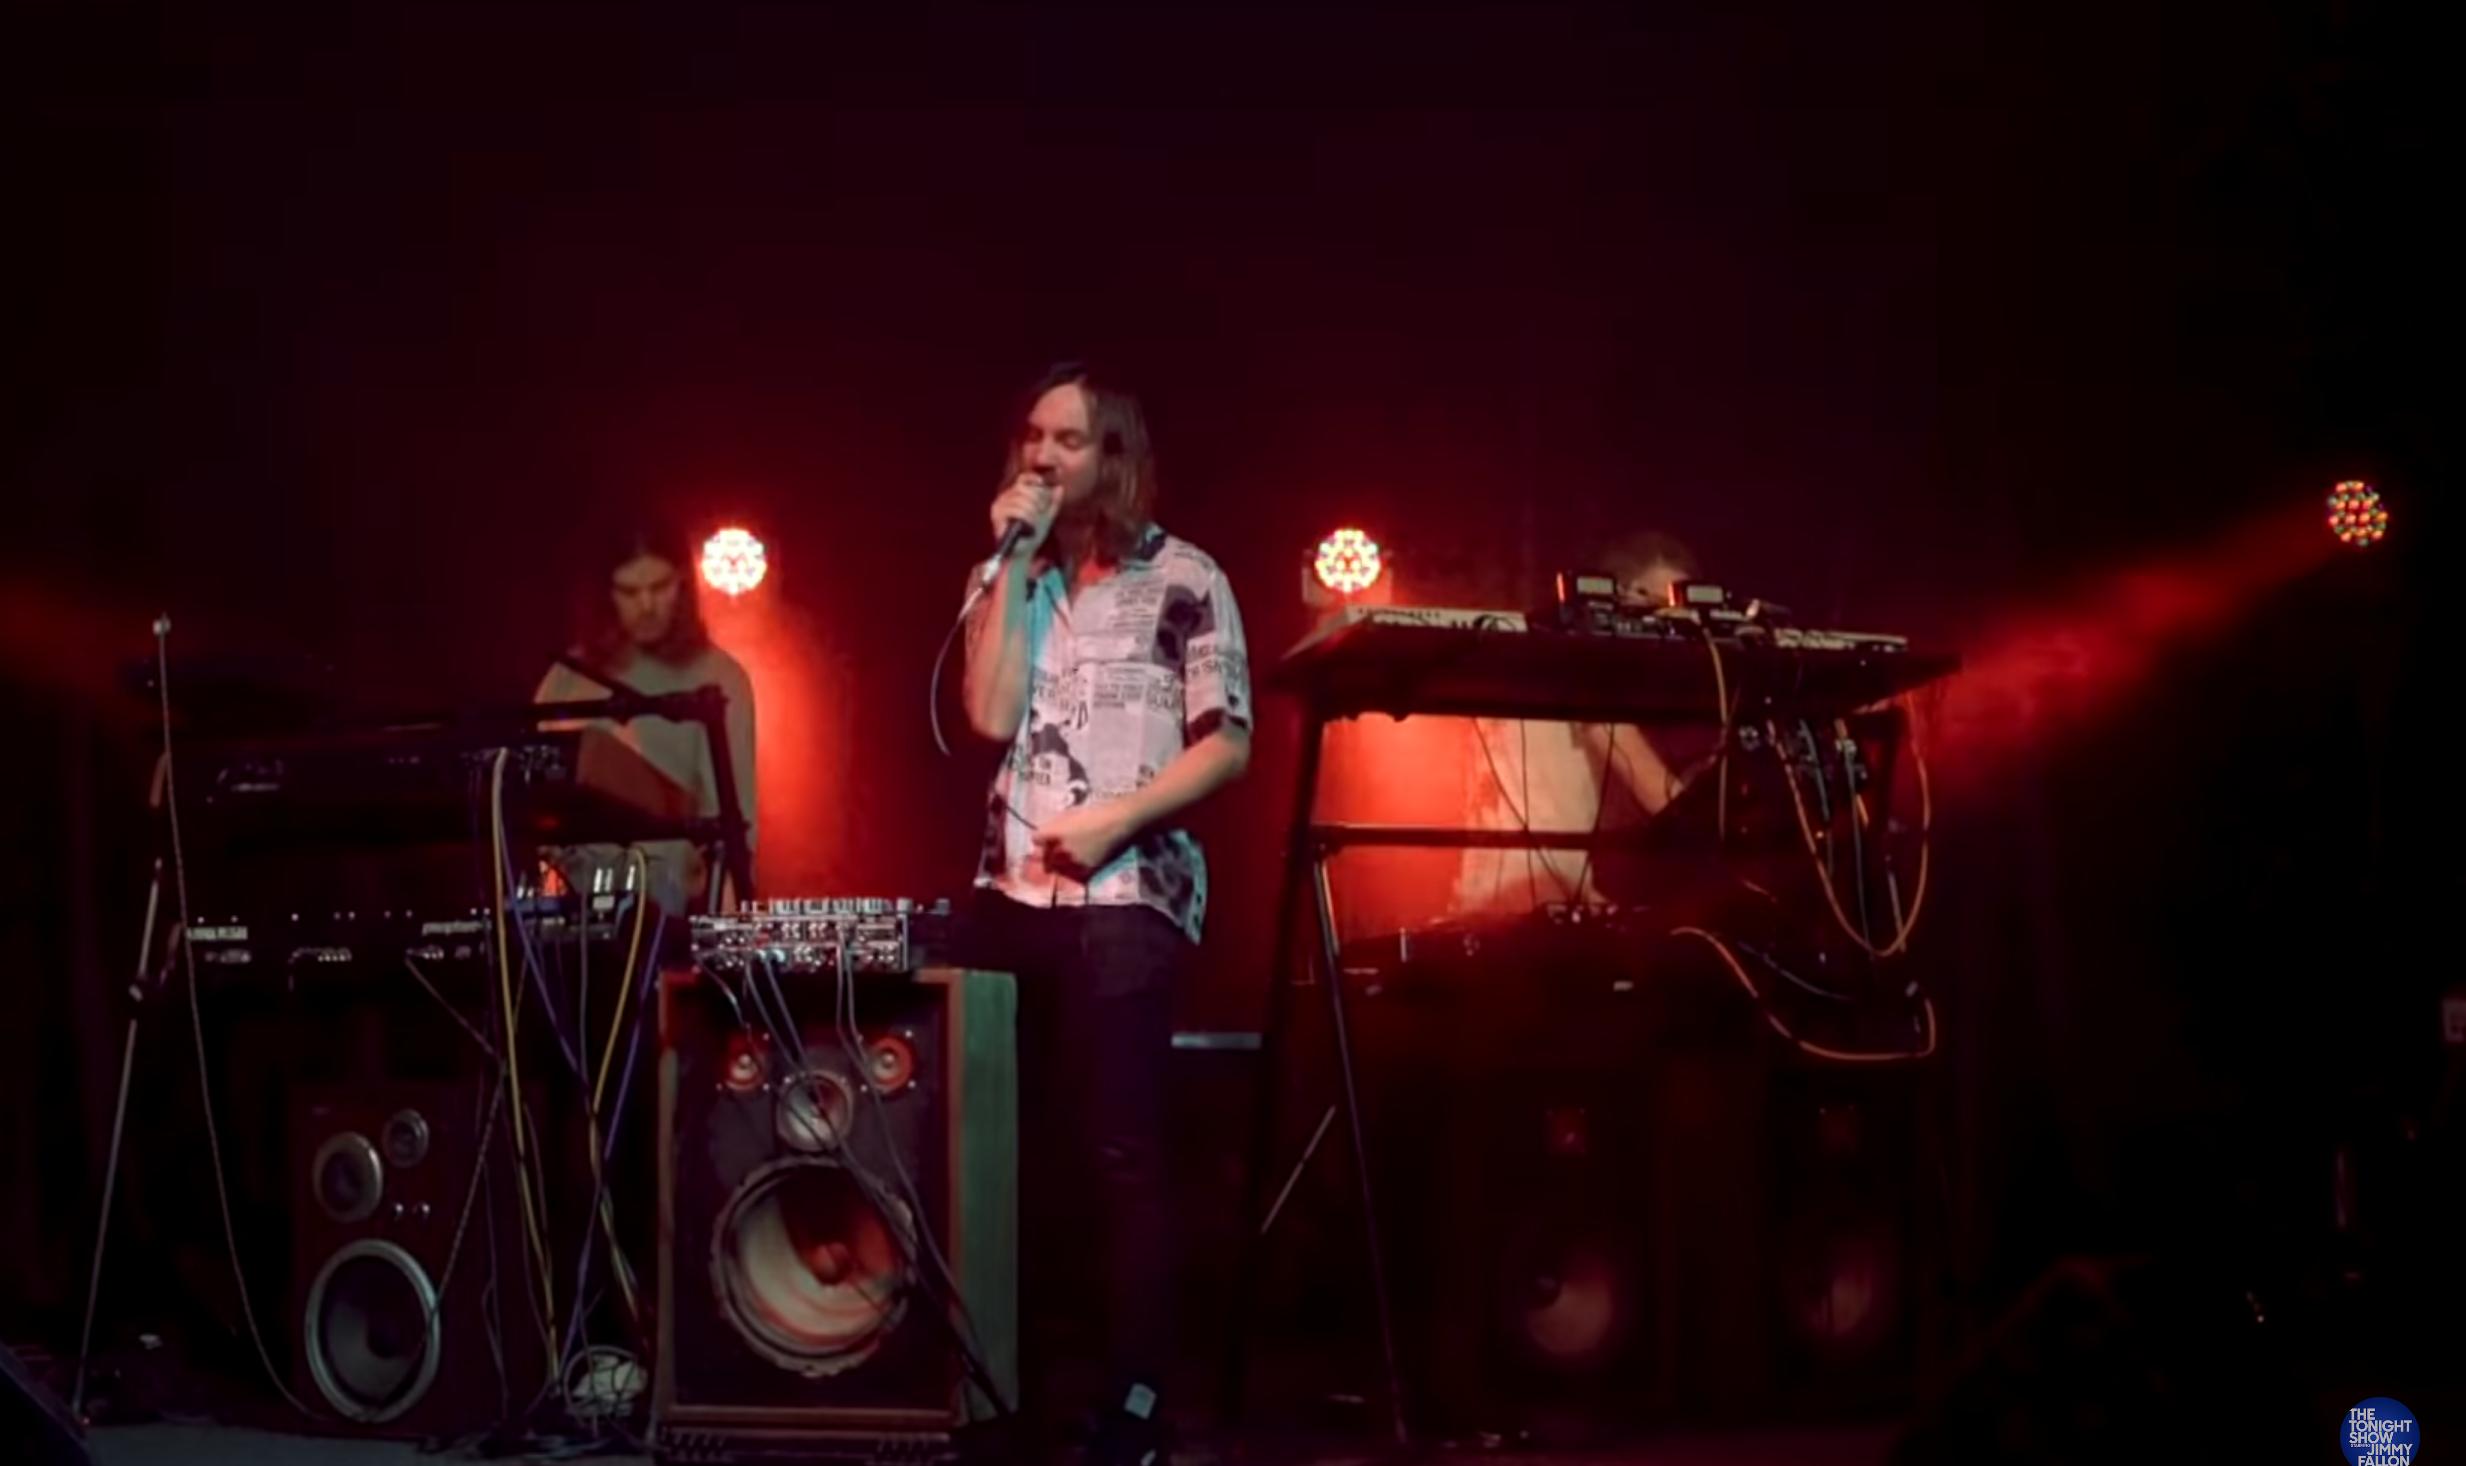 Tame Impala tonight show